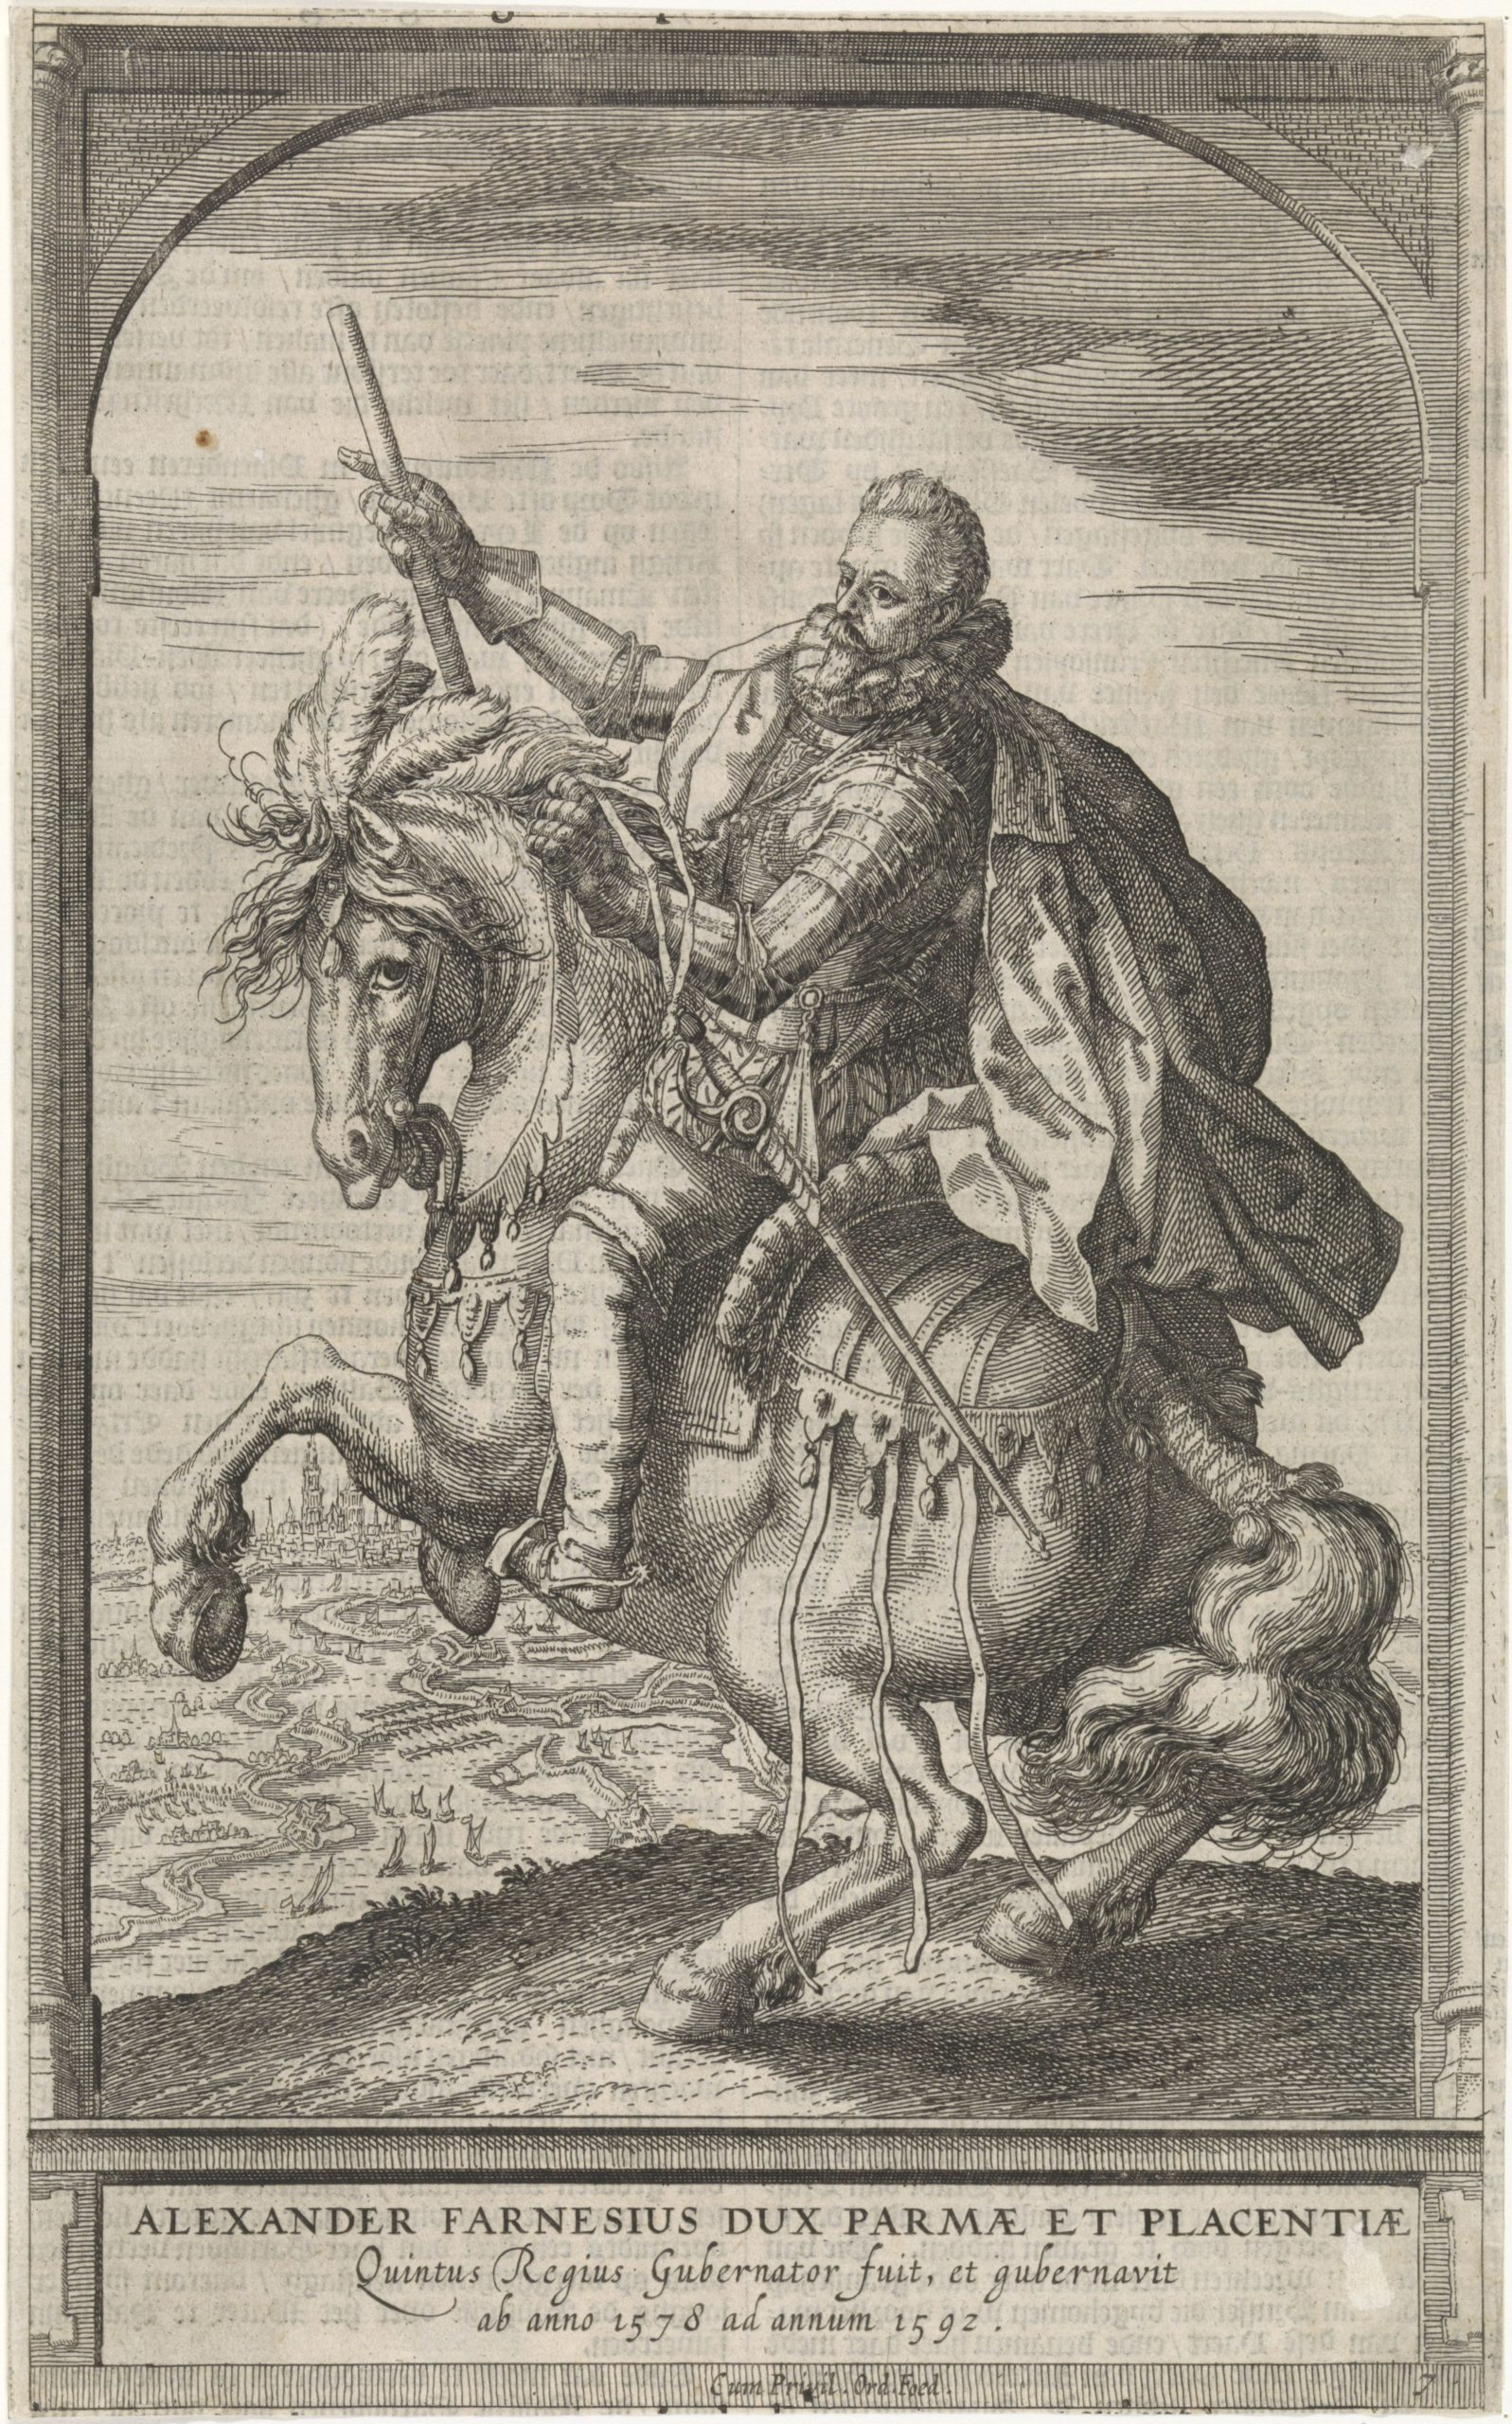 Alessandro Farnese, Duke of Parma, 1591 - 1632, Hessel Gerritsz, Amsterdam, Netherlands